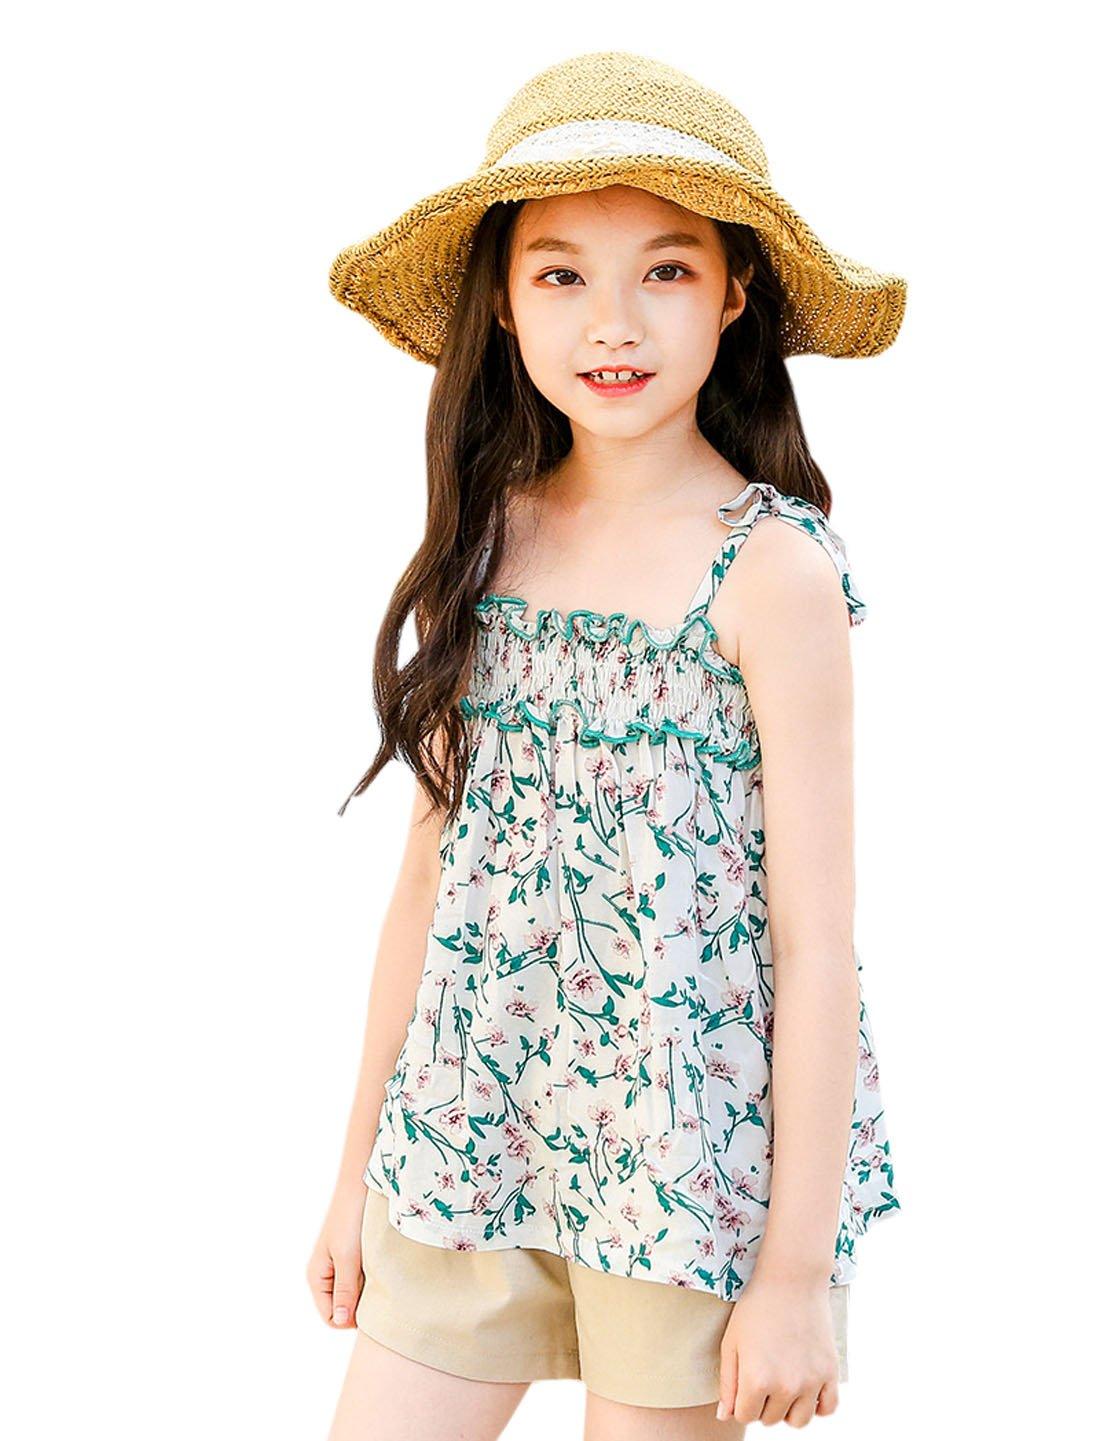 YueLian Girls Summer Sleeveless Loose Strap Tee Flower Beach Vest (9-10 Years)